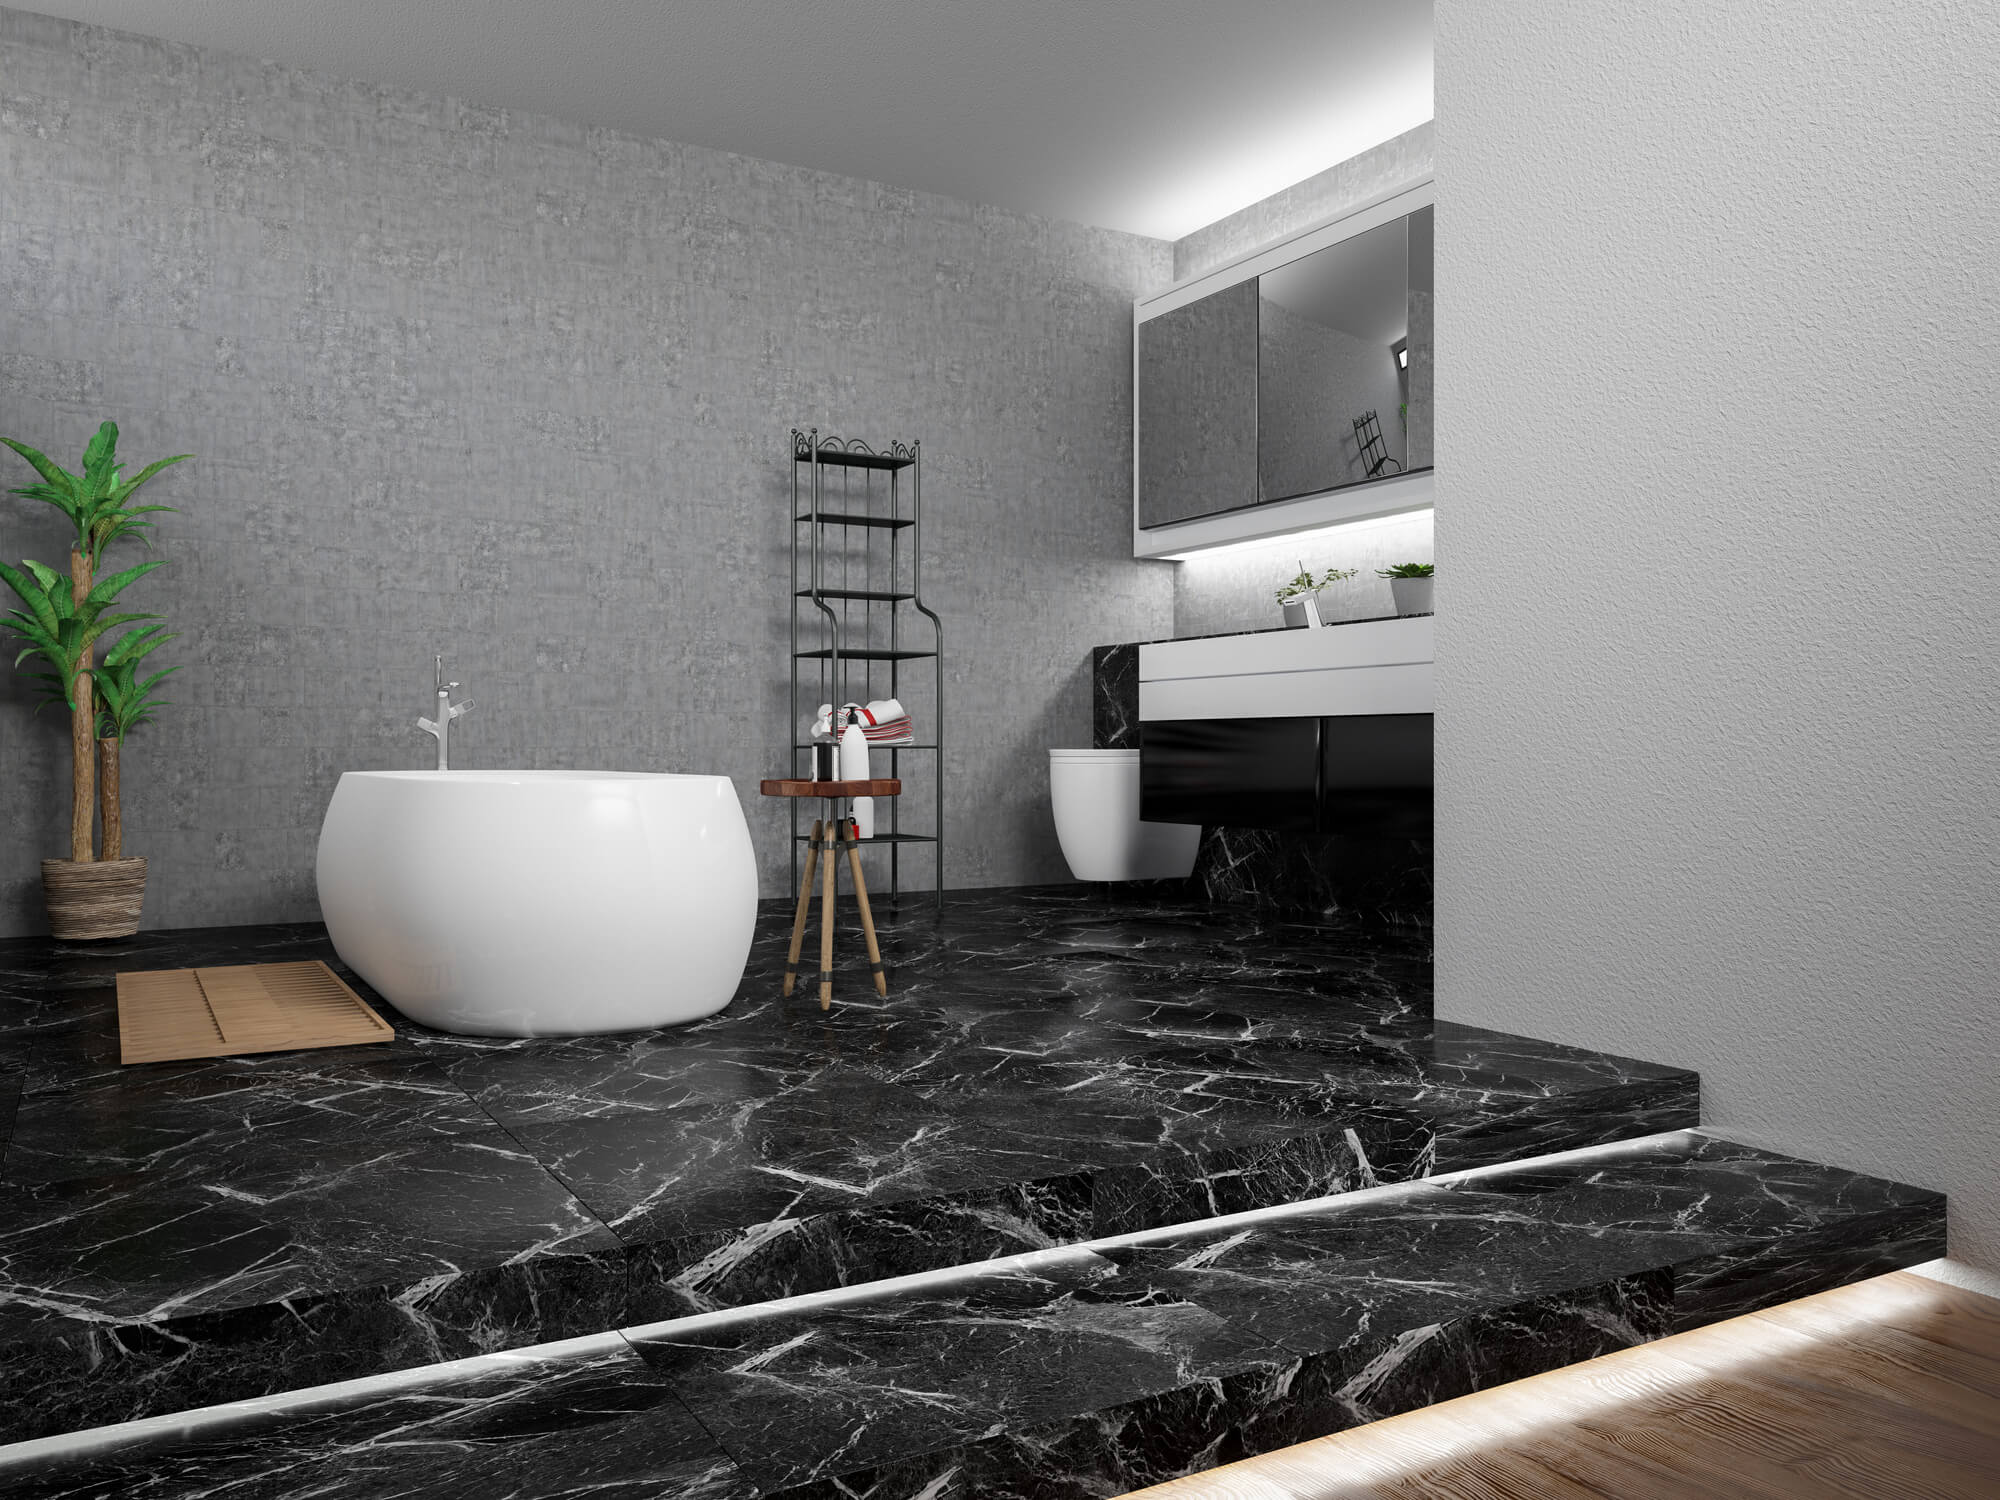 Pisos de mármore: suas características e quando utilizá-lo?